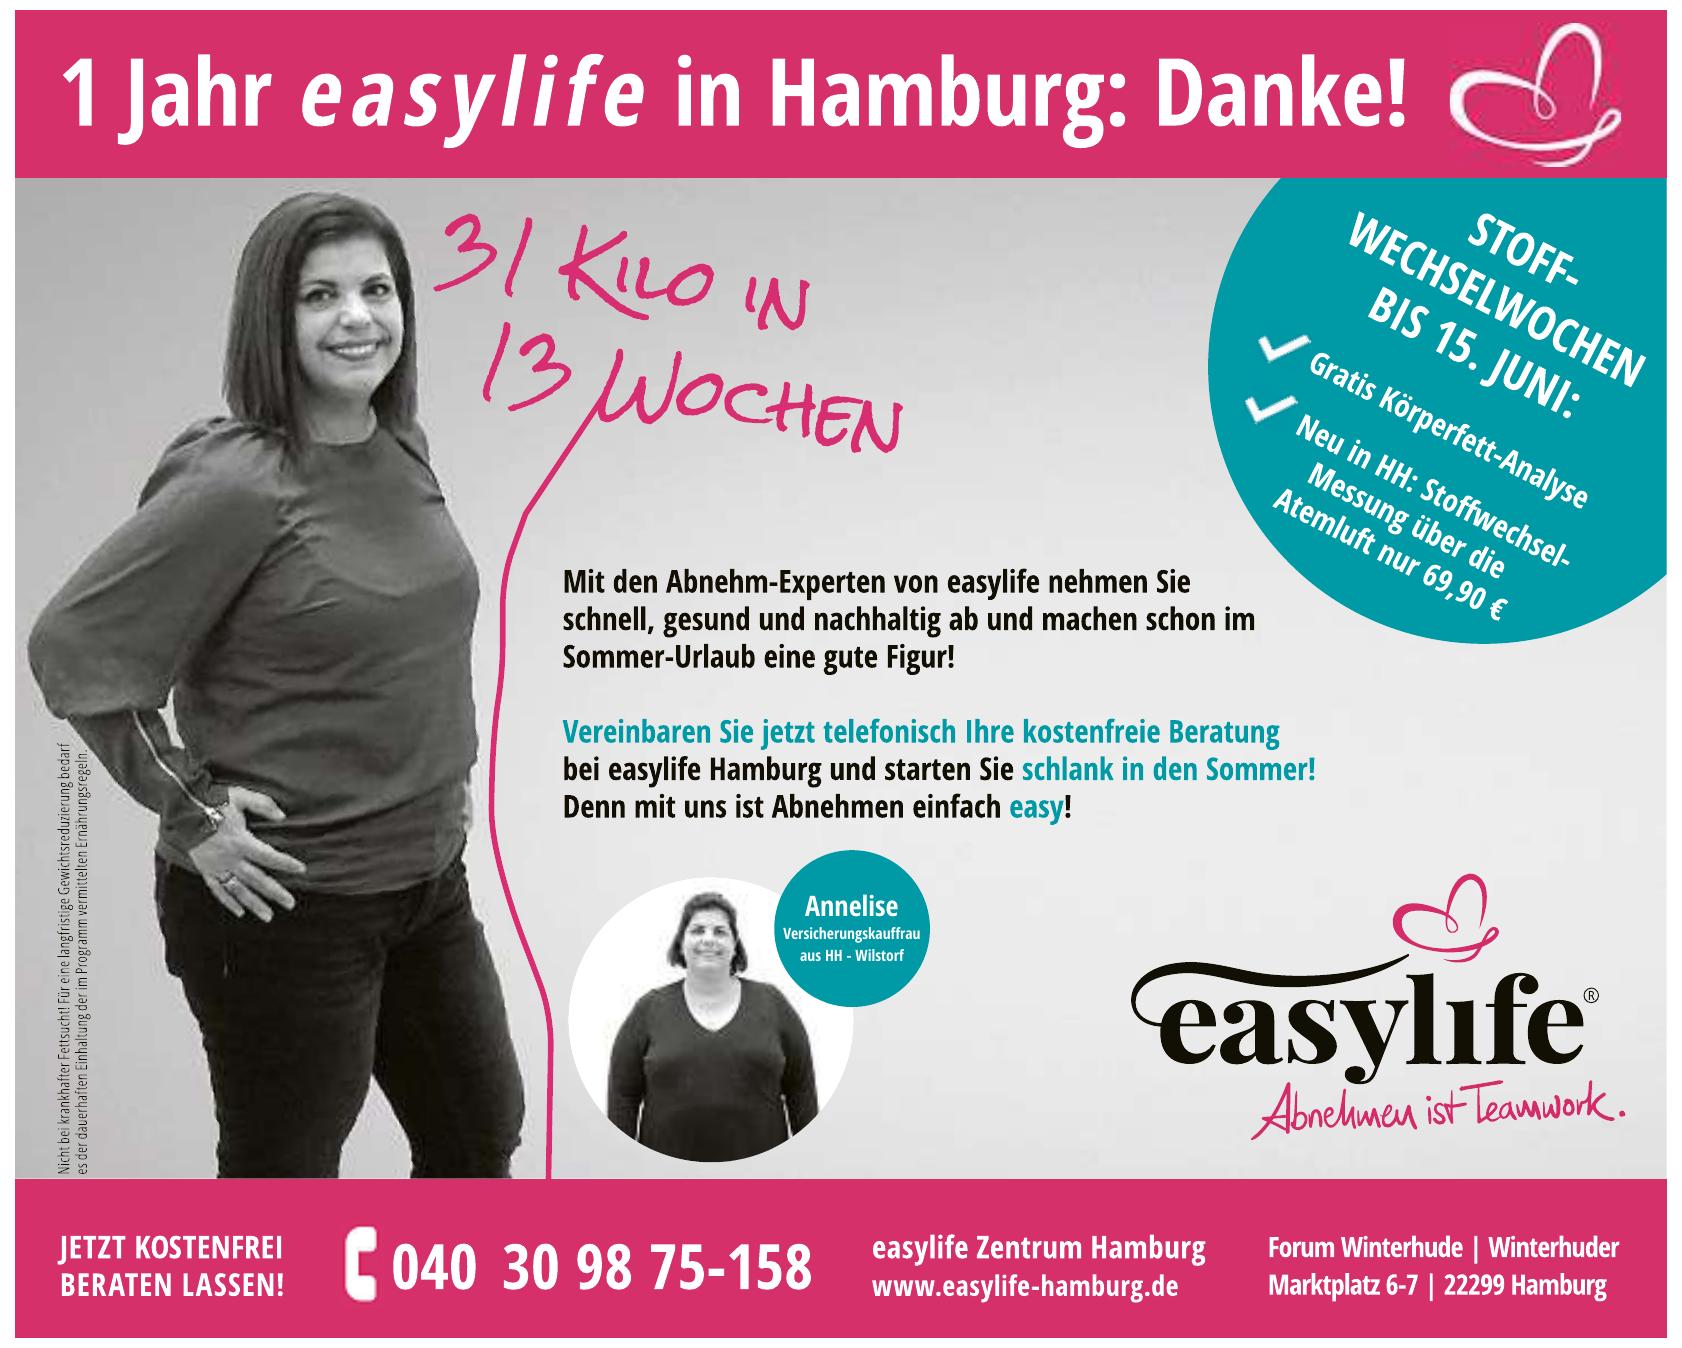 easylife Zentrum Hamburg